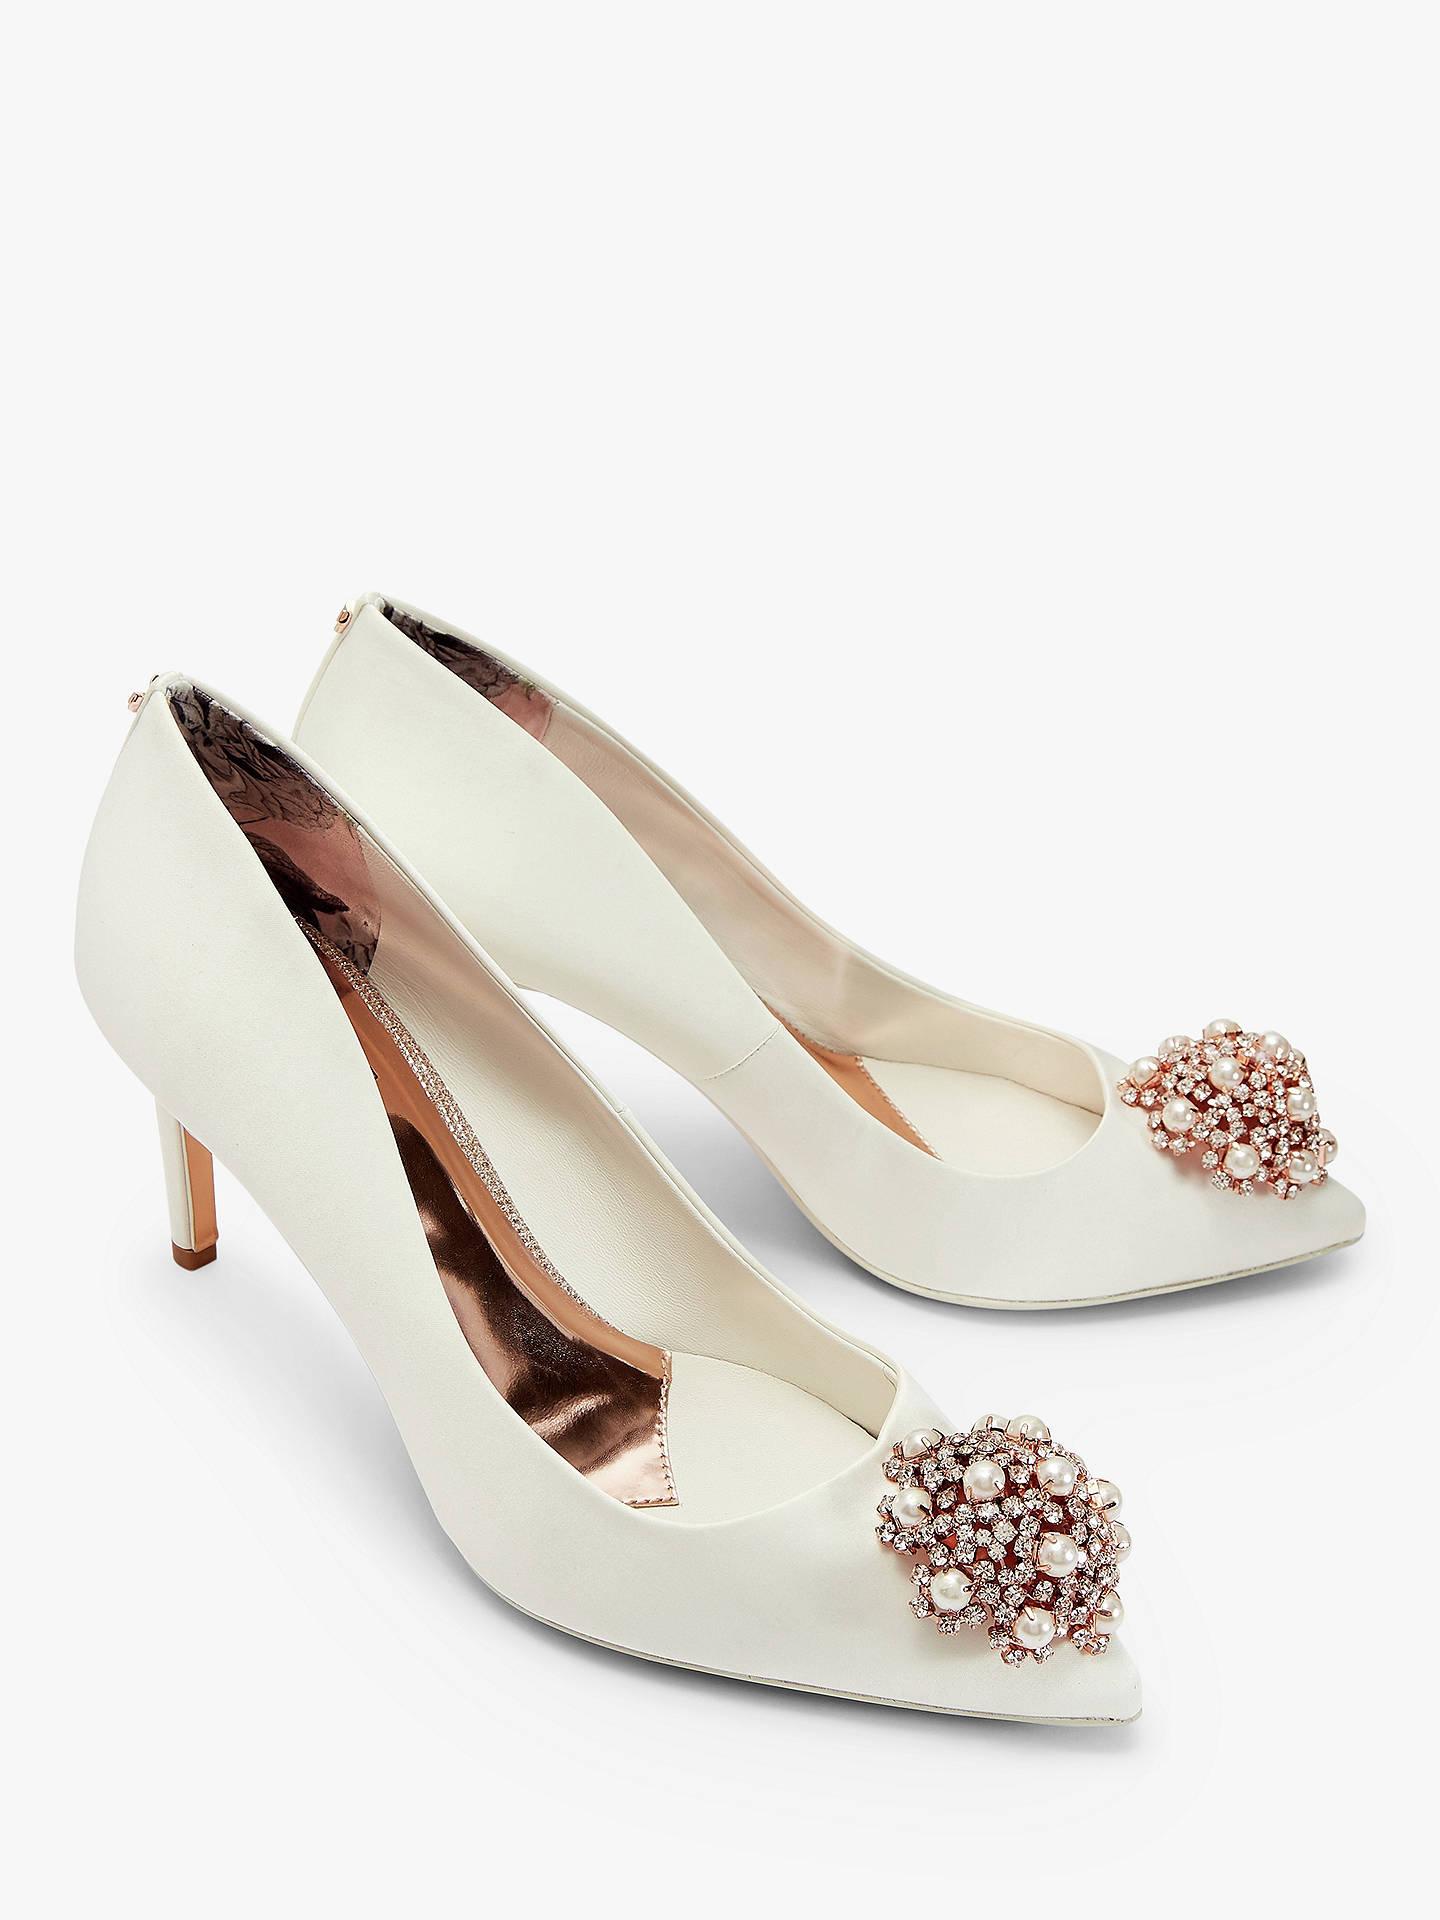 b9e34069dbf429 Buy Ted Baker Dahrlin Embellished Court Shoes, Ivory, 4 Online at  johnlewis.com ...